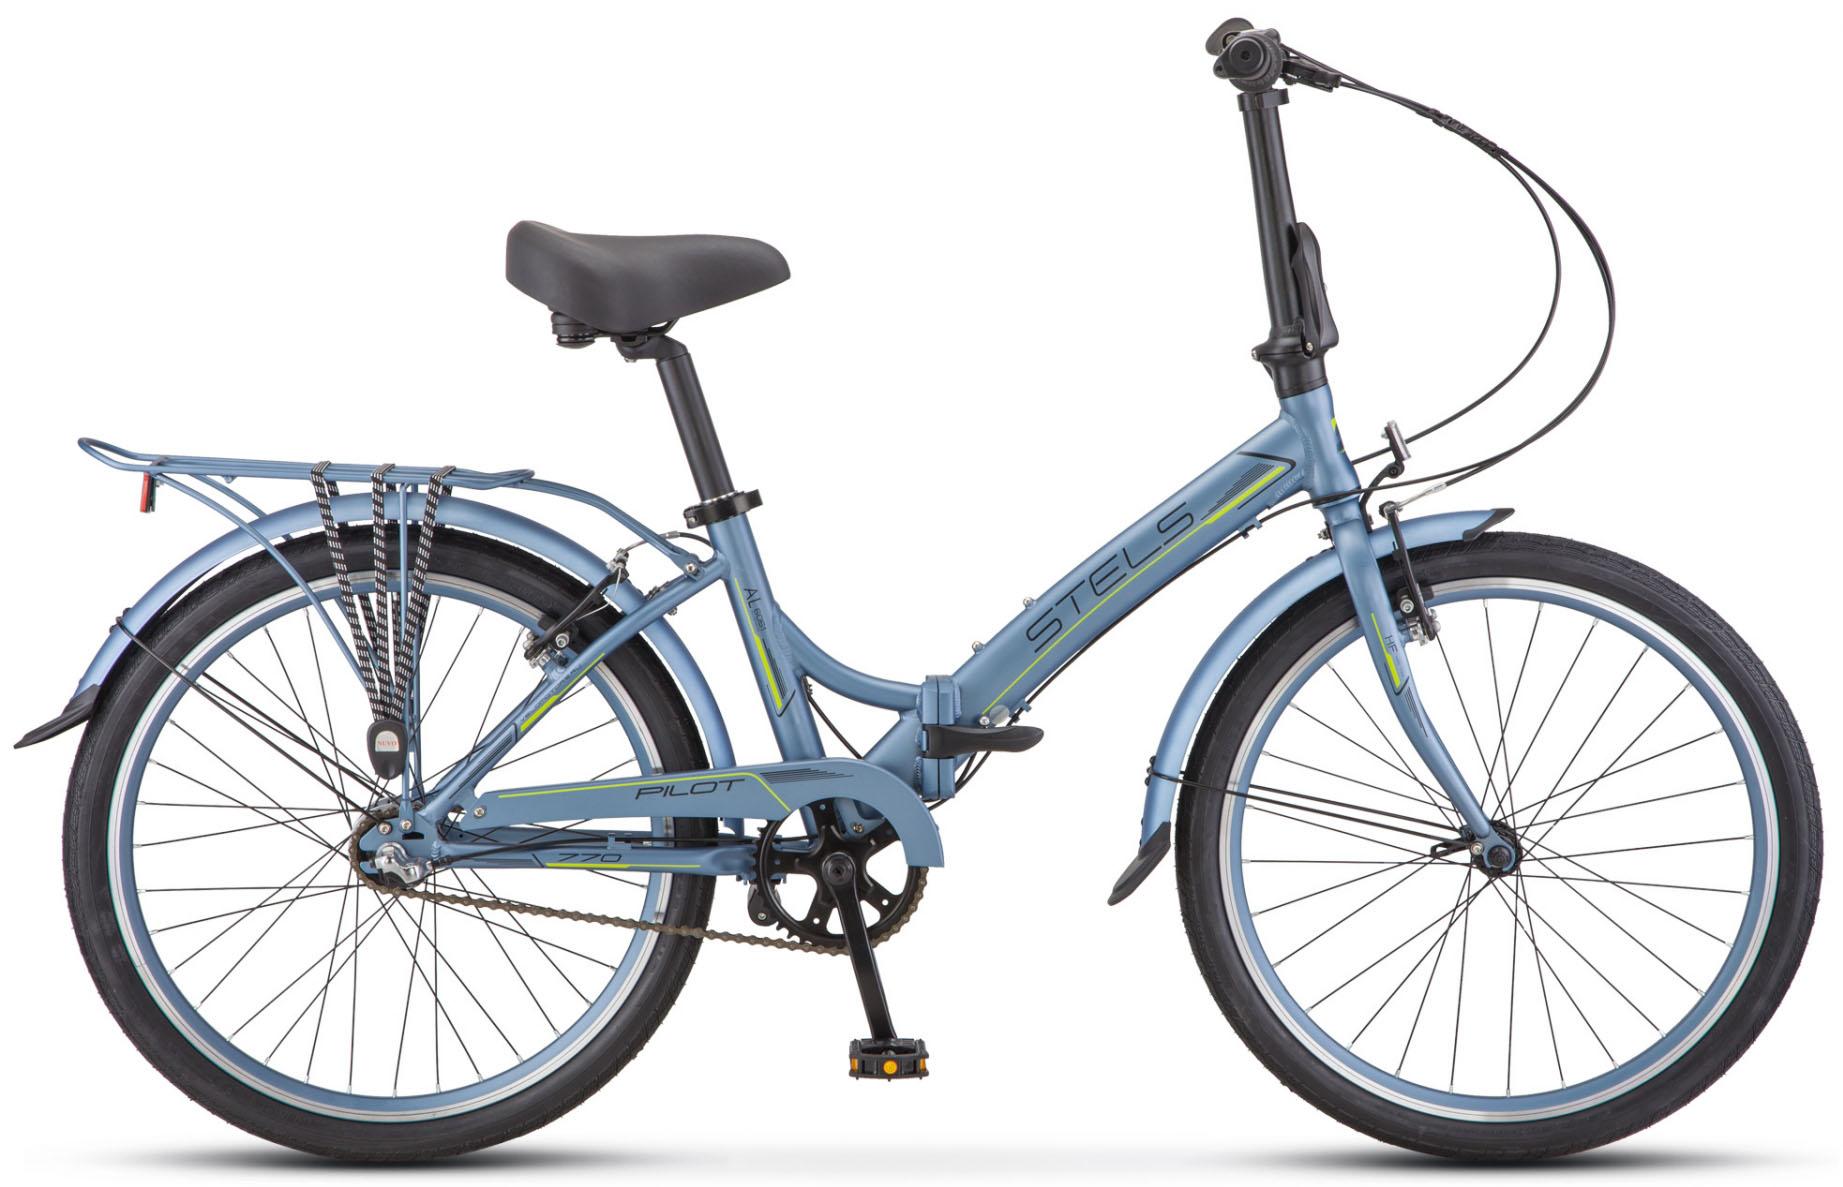 Велосипед Stels Pilot 770 24 V010 2019 велосипед stels pilot 750 2016